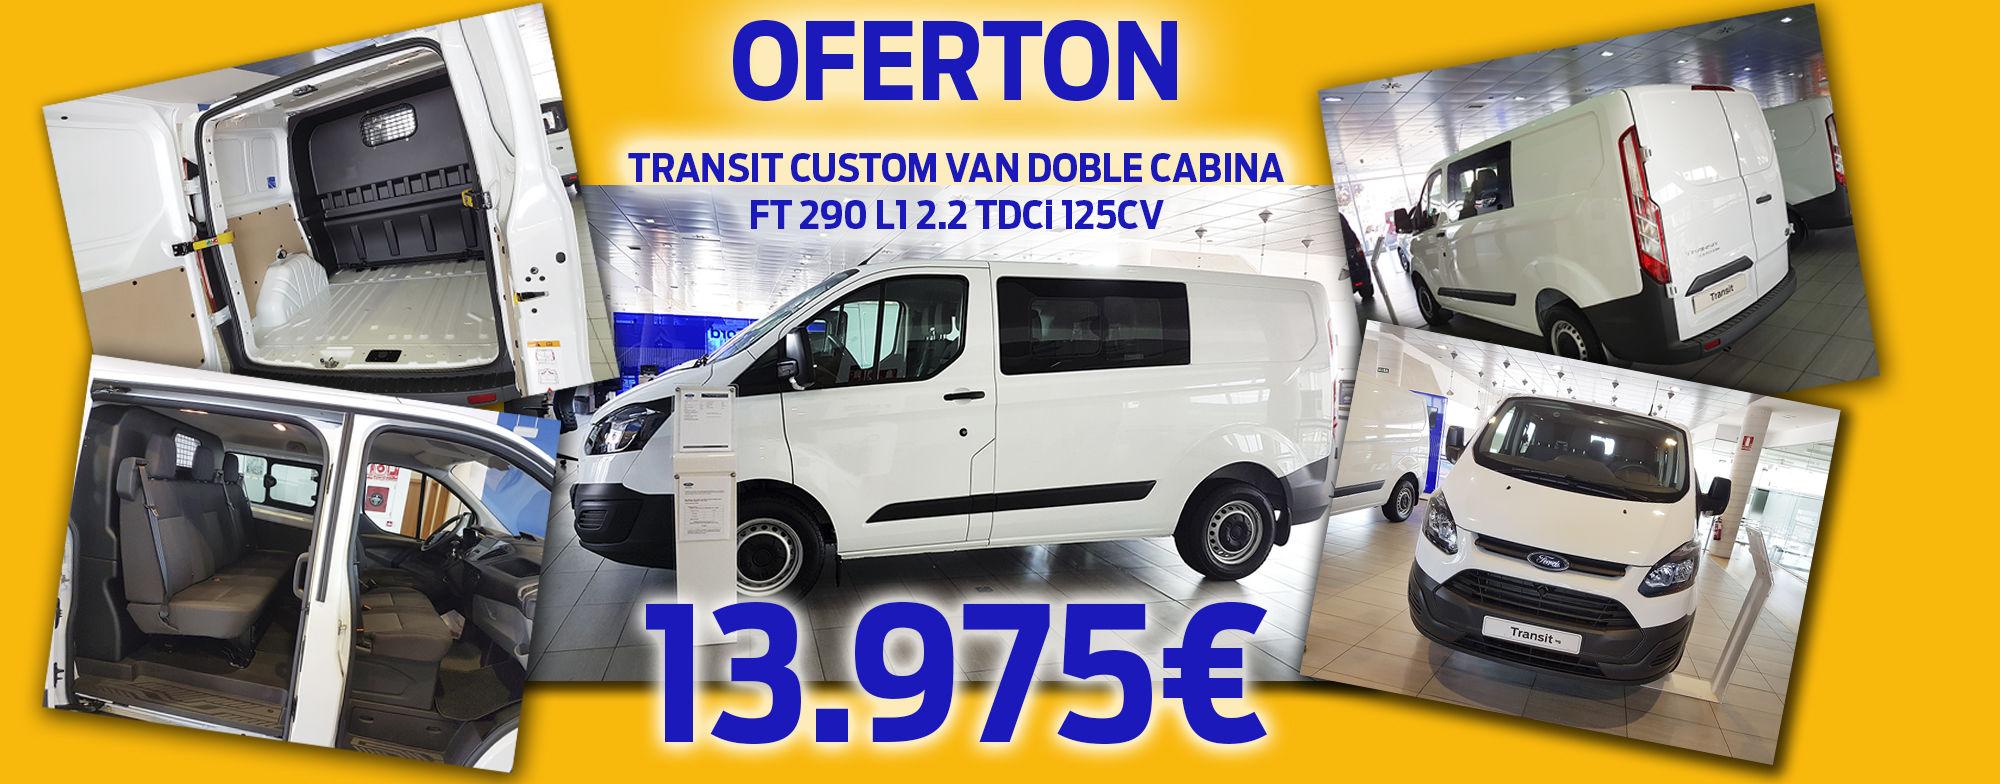 FORD TRANSIT CUSTOM VAN DOBLE CABINA  FT 290 L1 2.2 TDCi 125CV 13.975 €